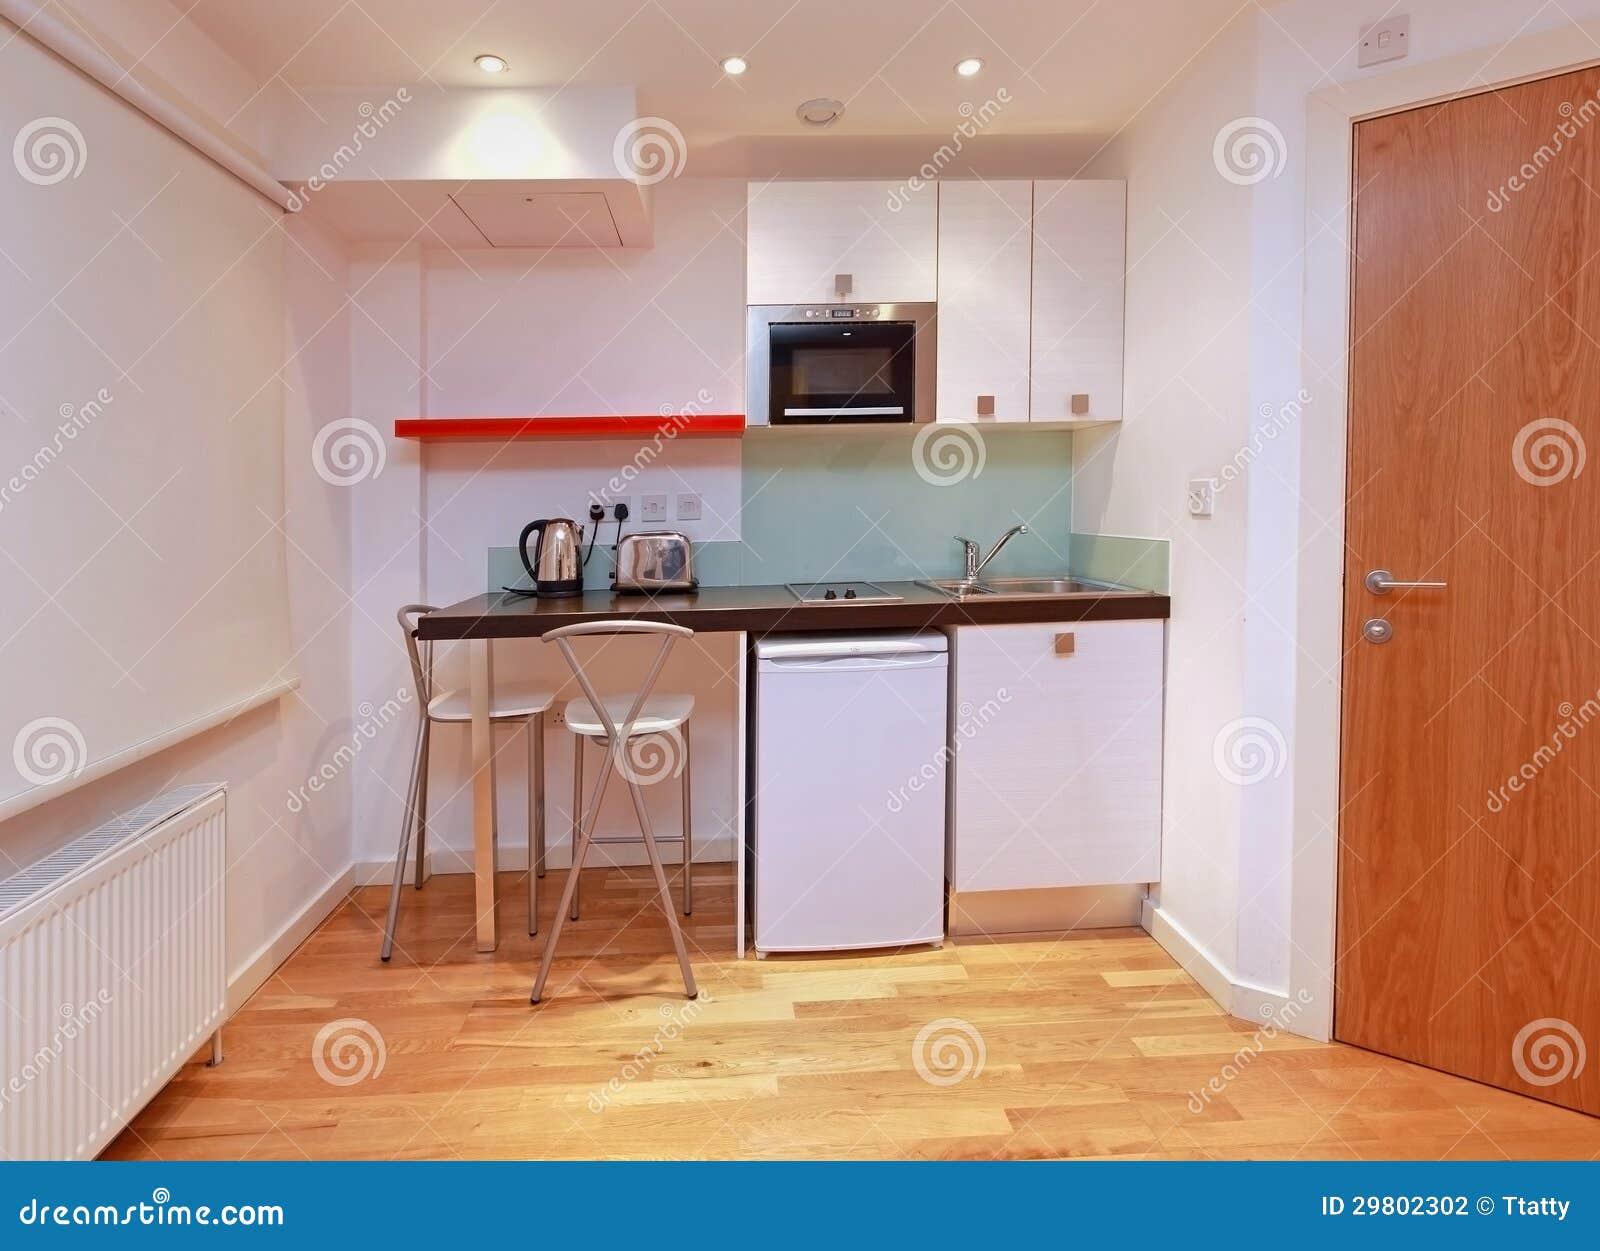 Moderne kleine keuken stock fotografie afbeelding 29802302 - Moderne kleine keuken ...